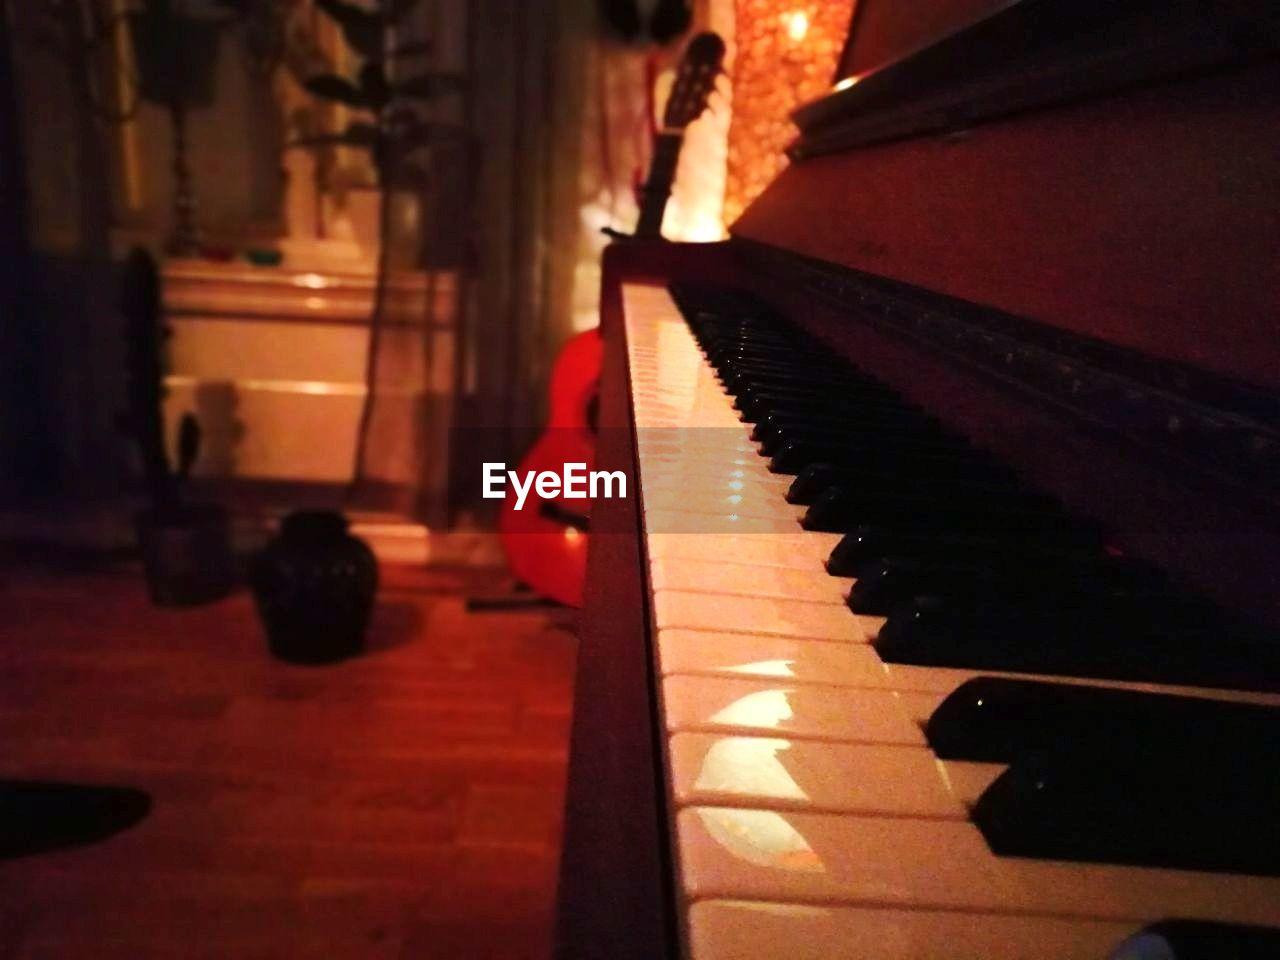 musical instrument, music, piano, indoors, piano key, no people, illuminated, close-up, day